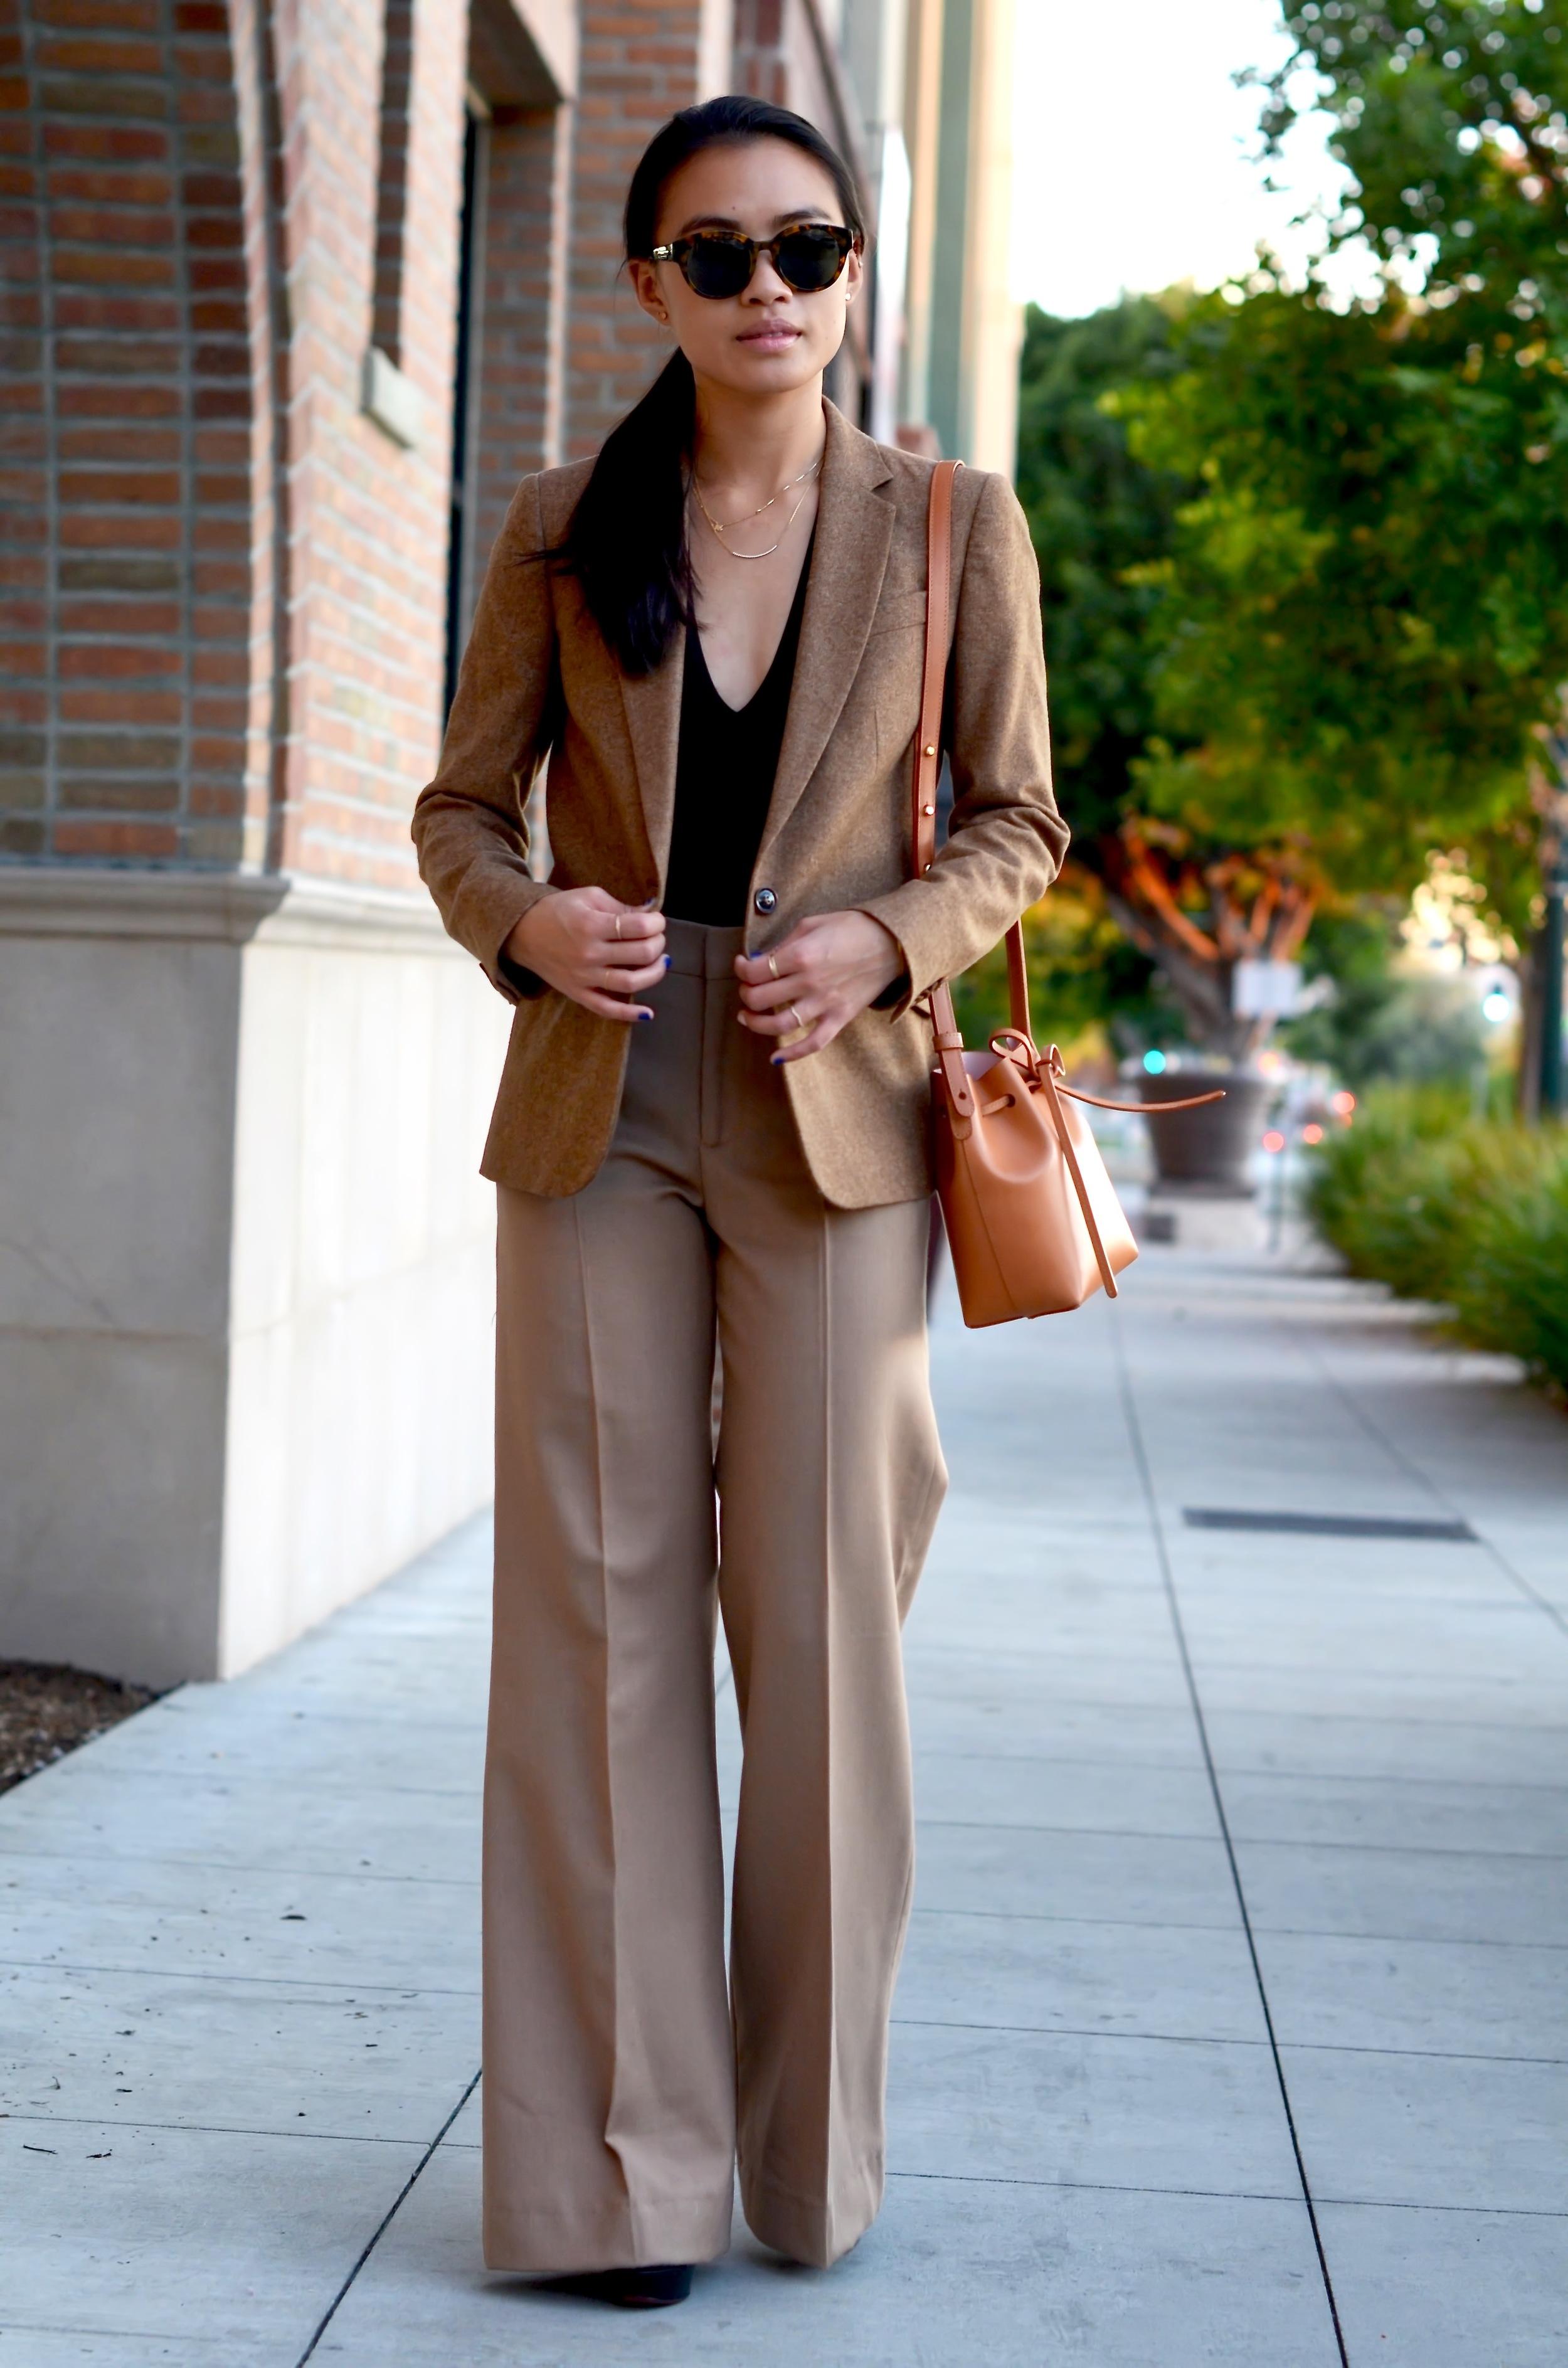 Just Goh With It-Outfit-shopstyle-dressforsuccess-zara-camel-wide-leg-pants-massimo-dutti-blazer-mansur-gavriel-mini-bucket-bag-1.jpg